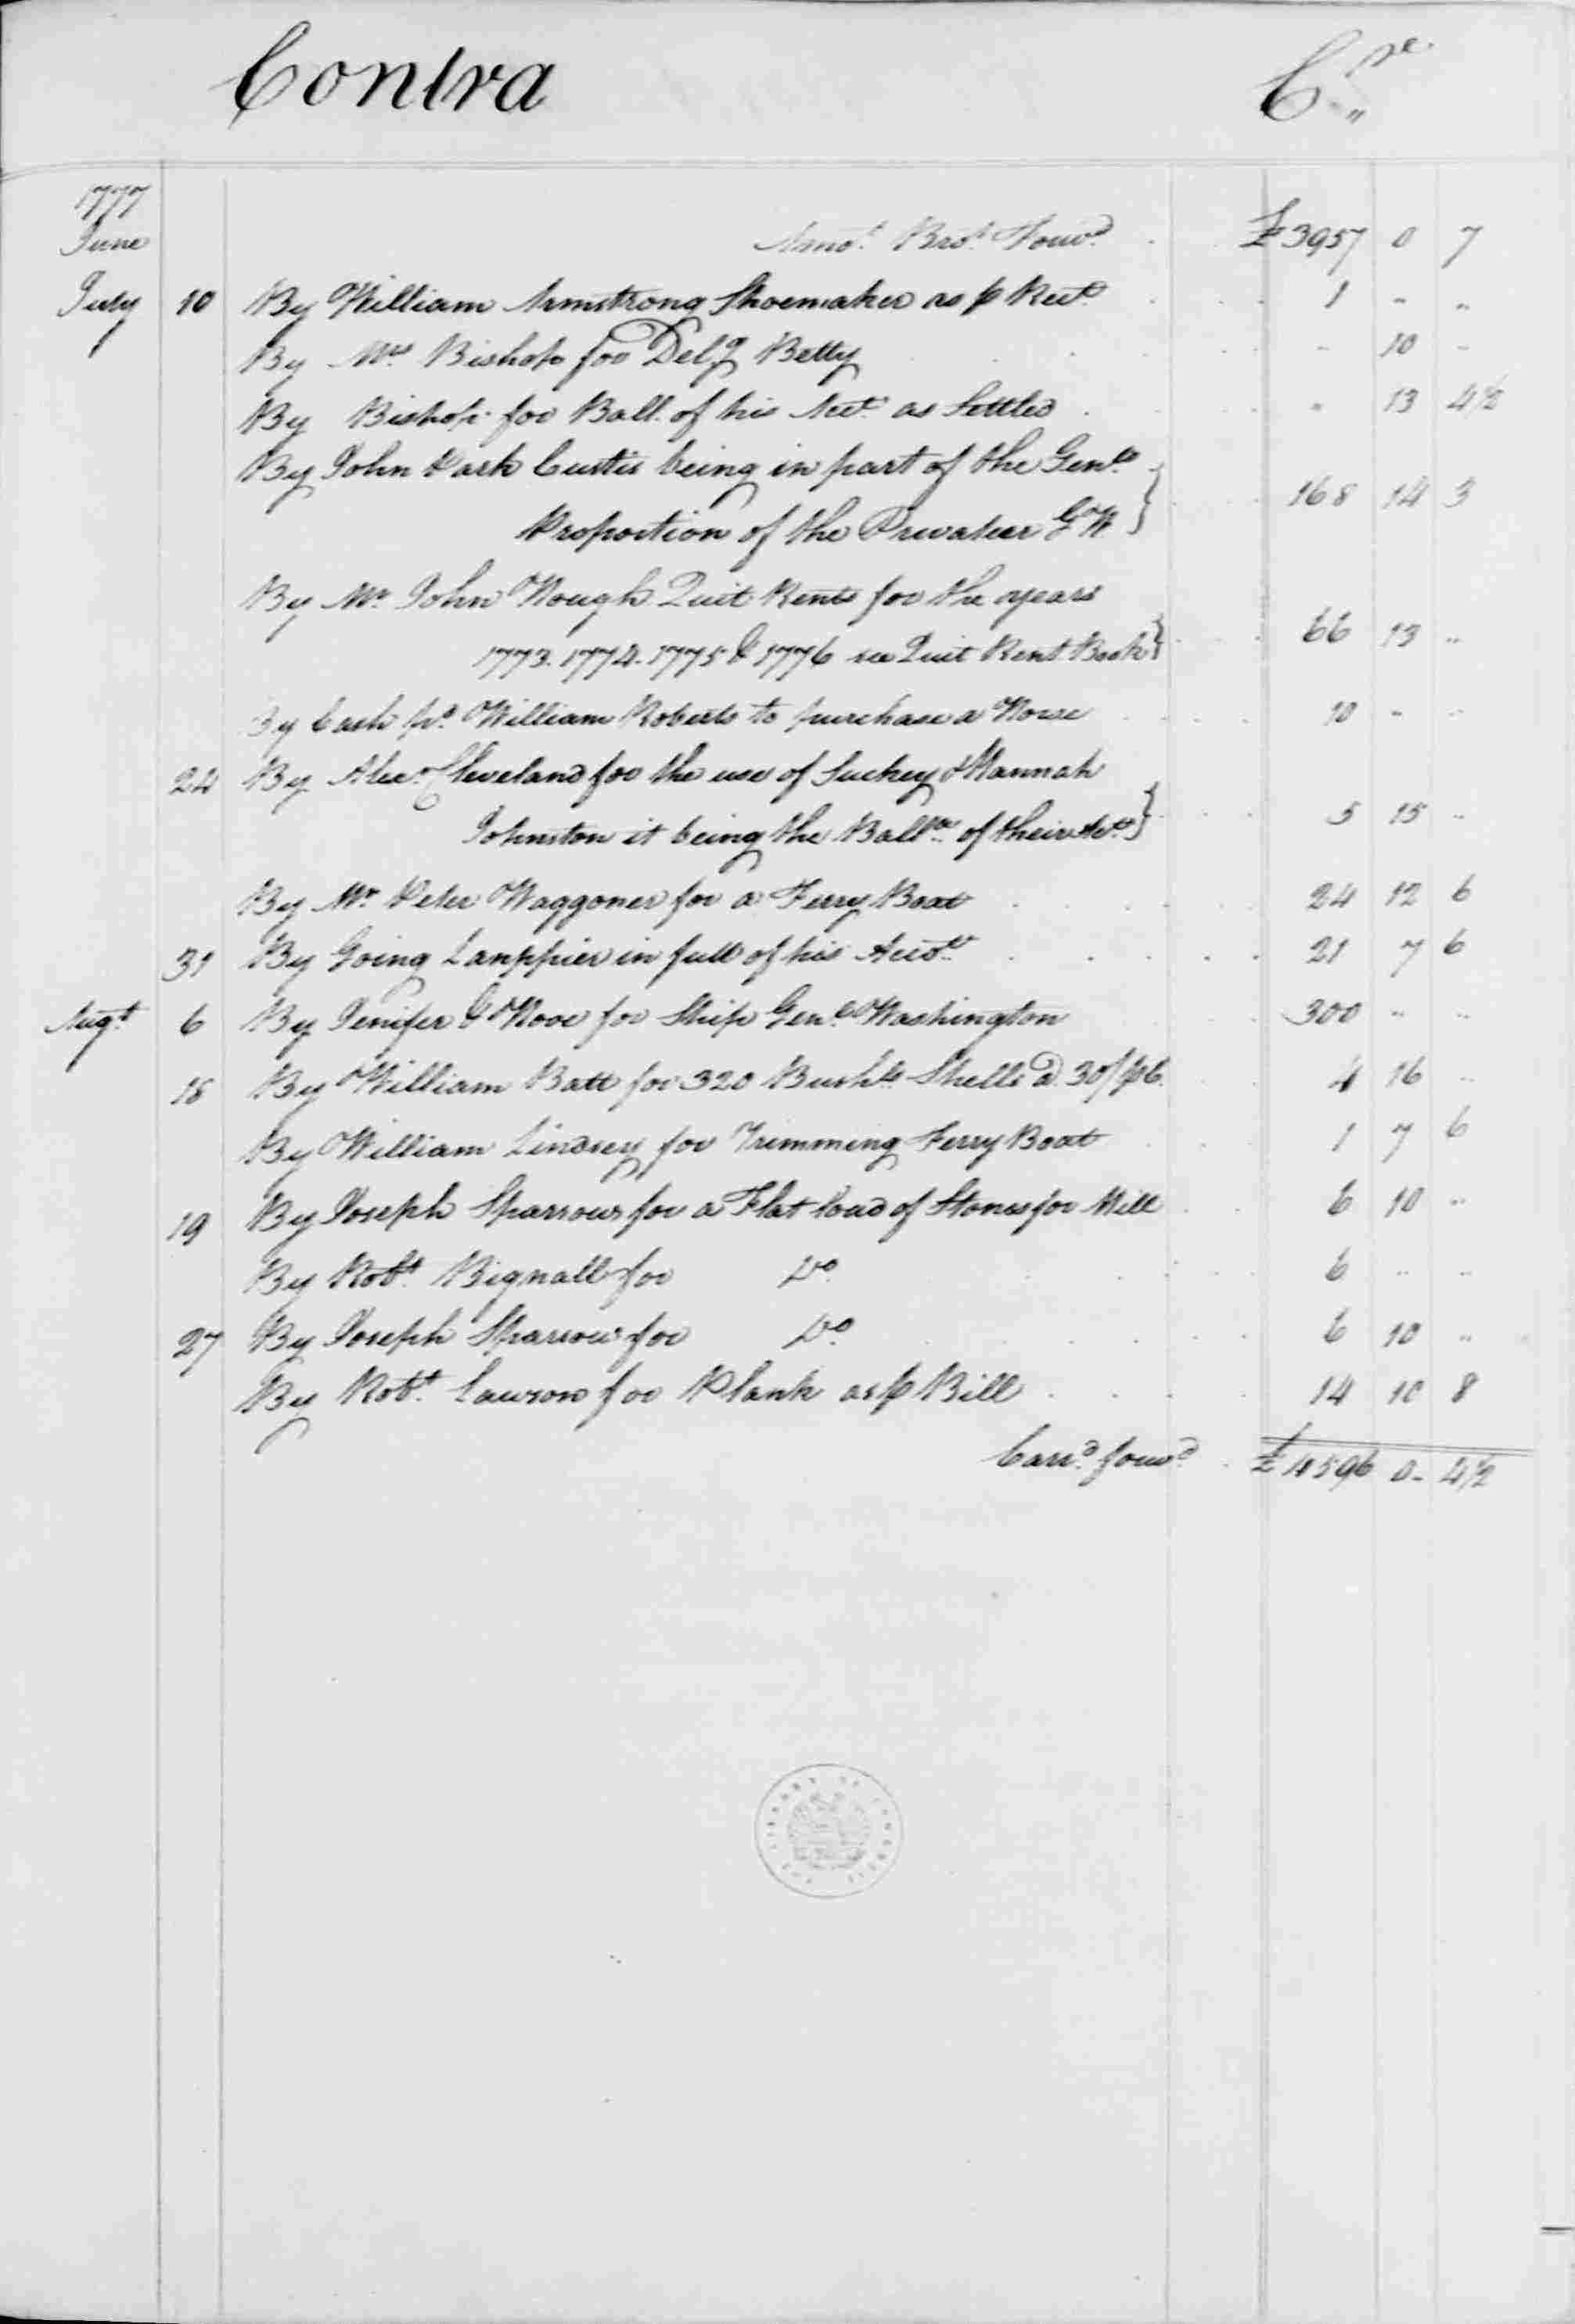 Ledger B, folio 150, right side